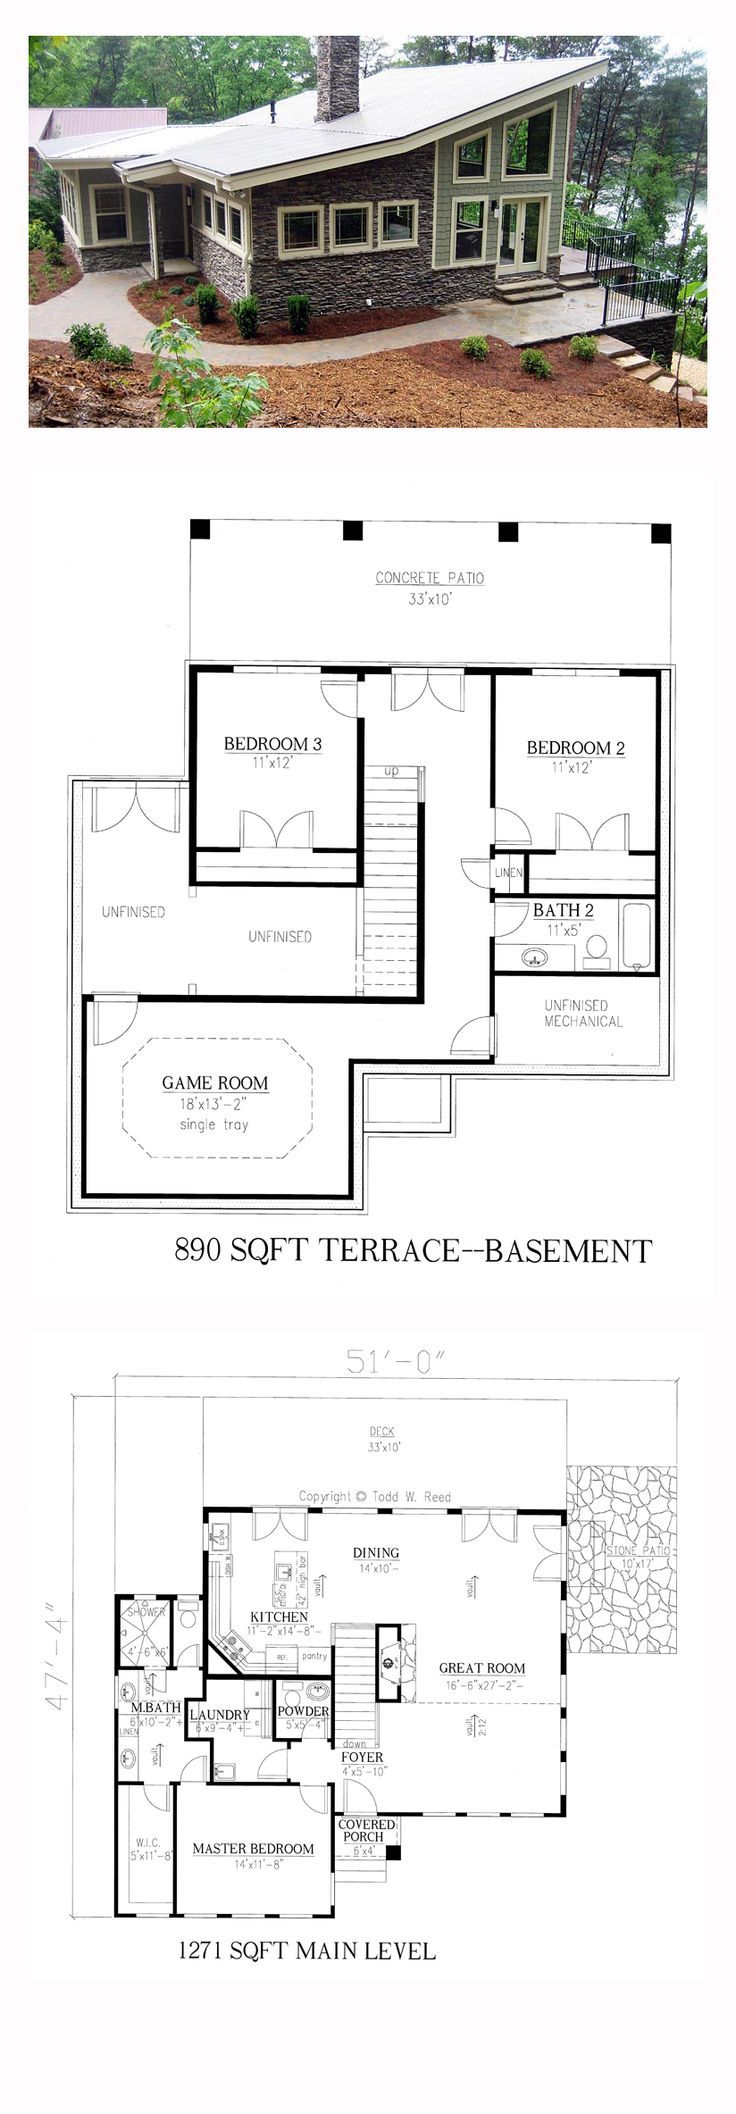 3 Bedroom Modern House Design Modern House Plan 50258  Total Living Area 2161 Sqft 3